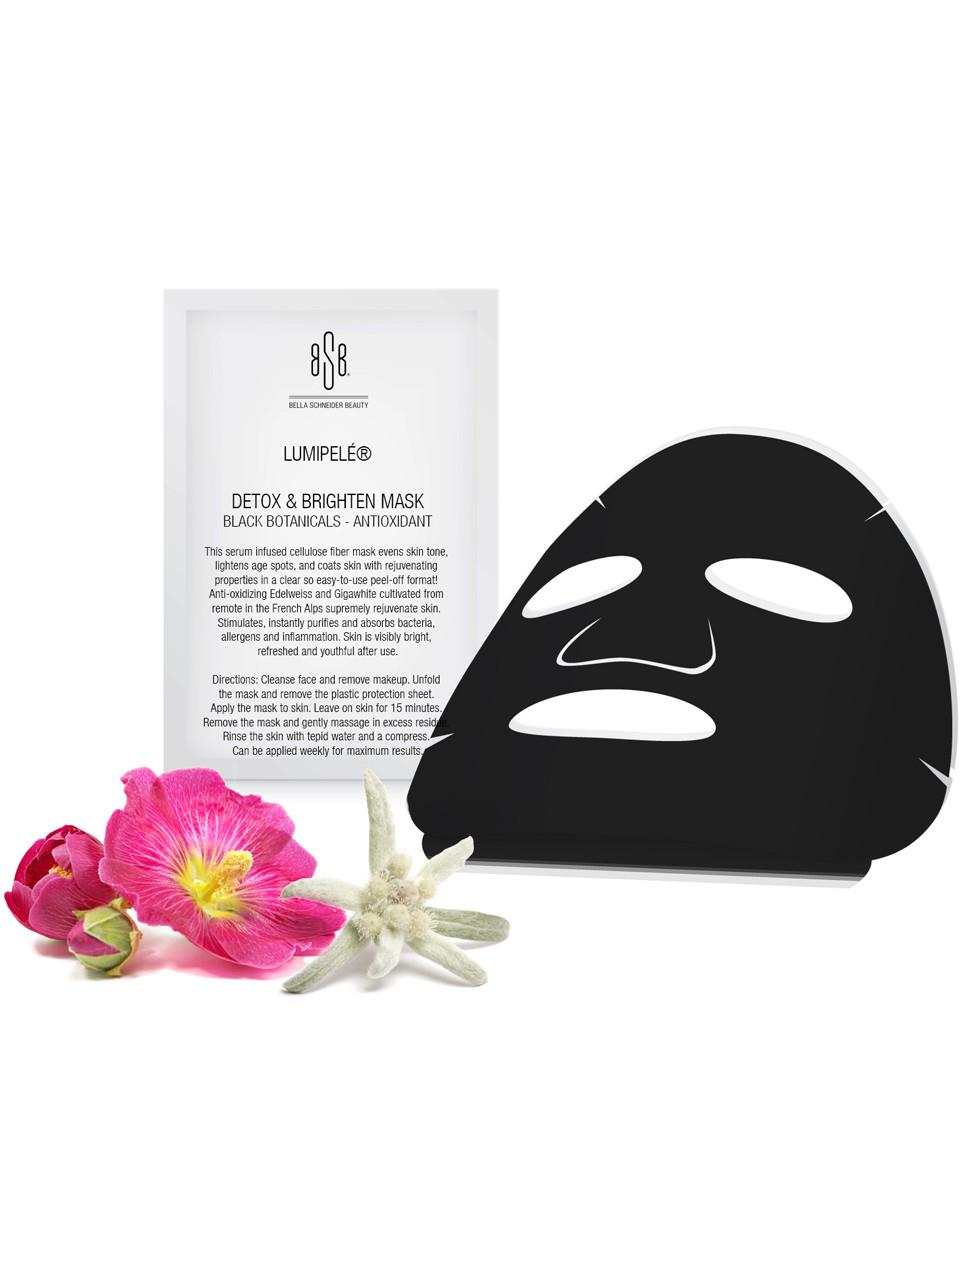 Detox & Brighten Mask Black Botanicals - Antioxidant (Set of 3)